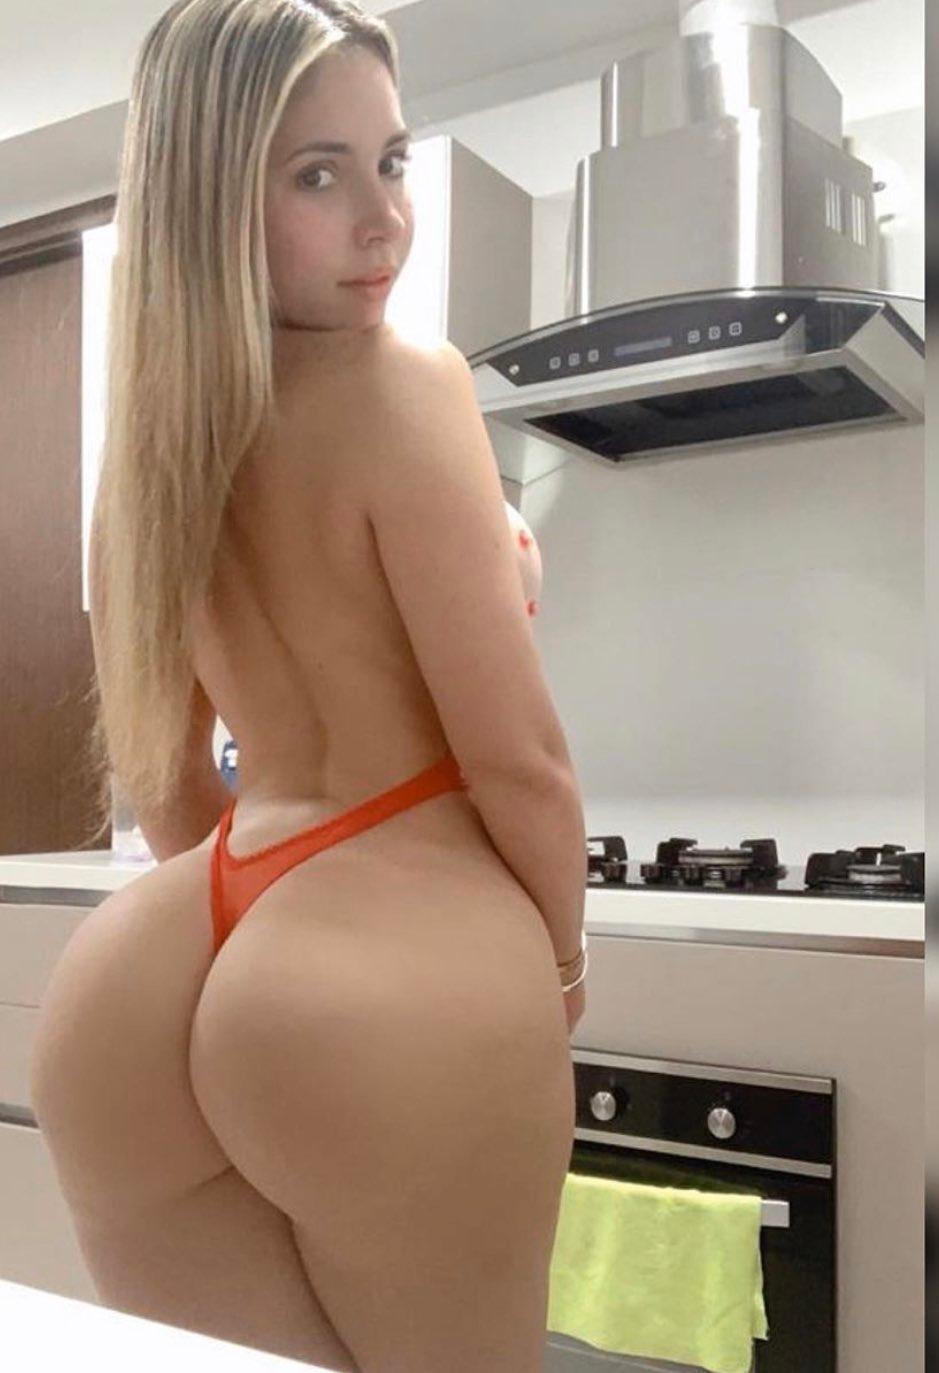 Imagen con etiquetas:En Topless, Interesante, Chica